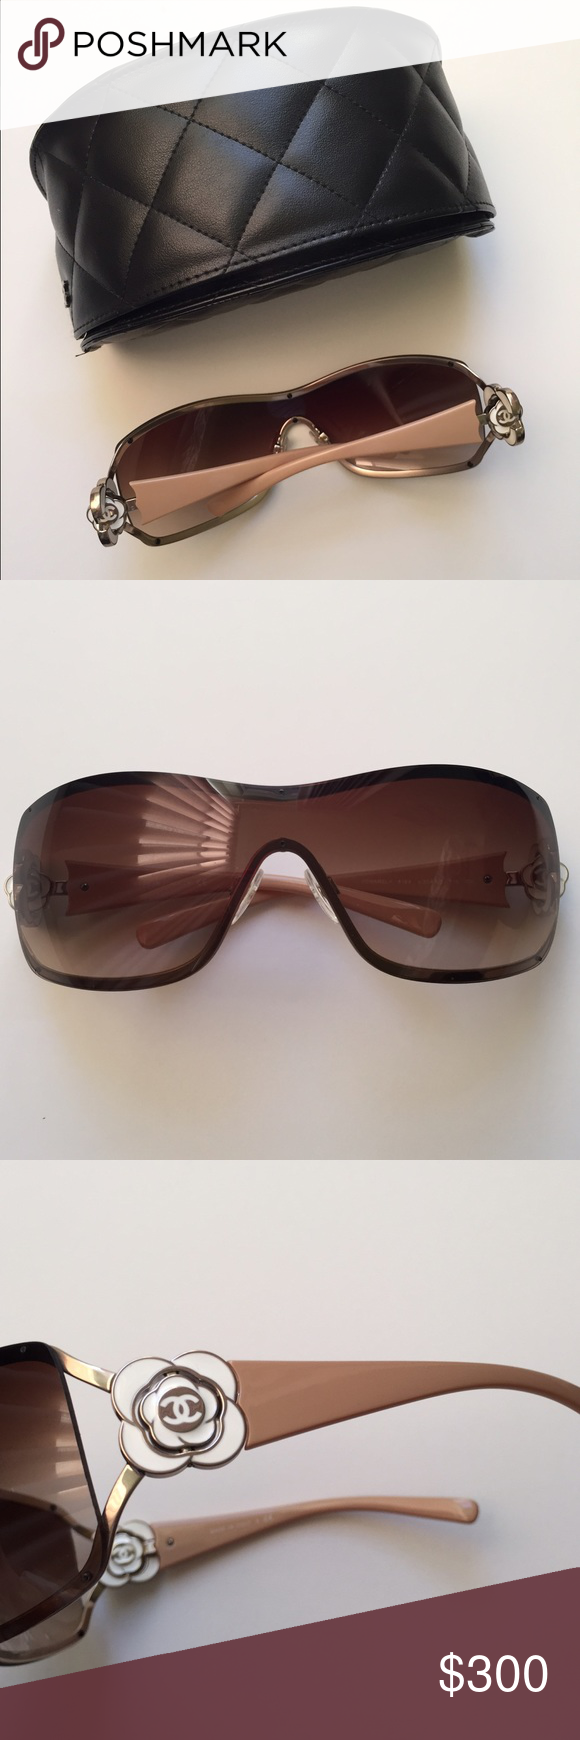 6abab390de34 Authentic Chanel Shield Camellia Sunglasses-new Brand new frame ...